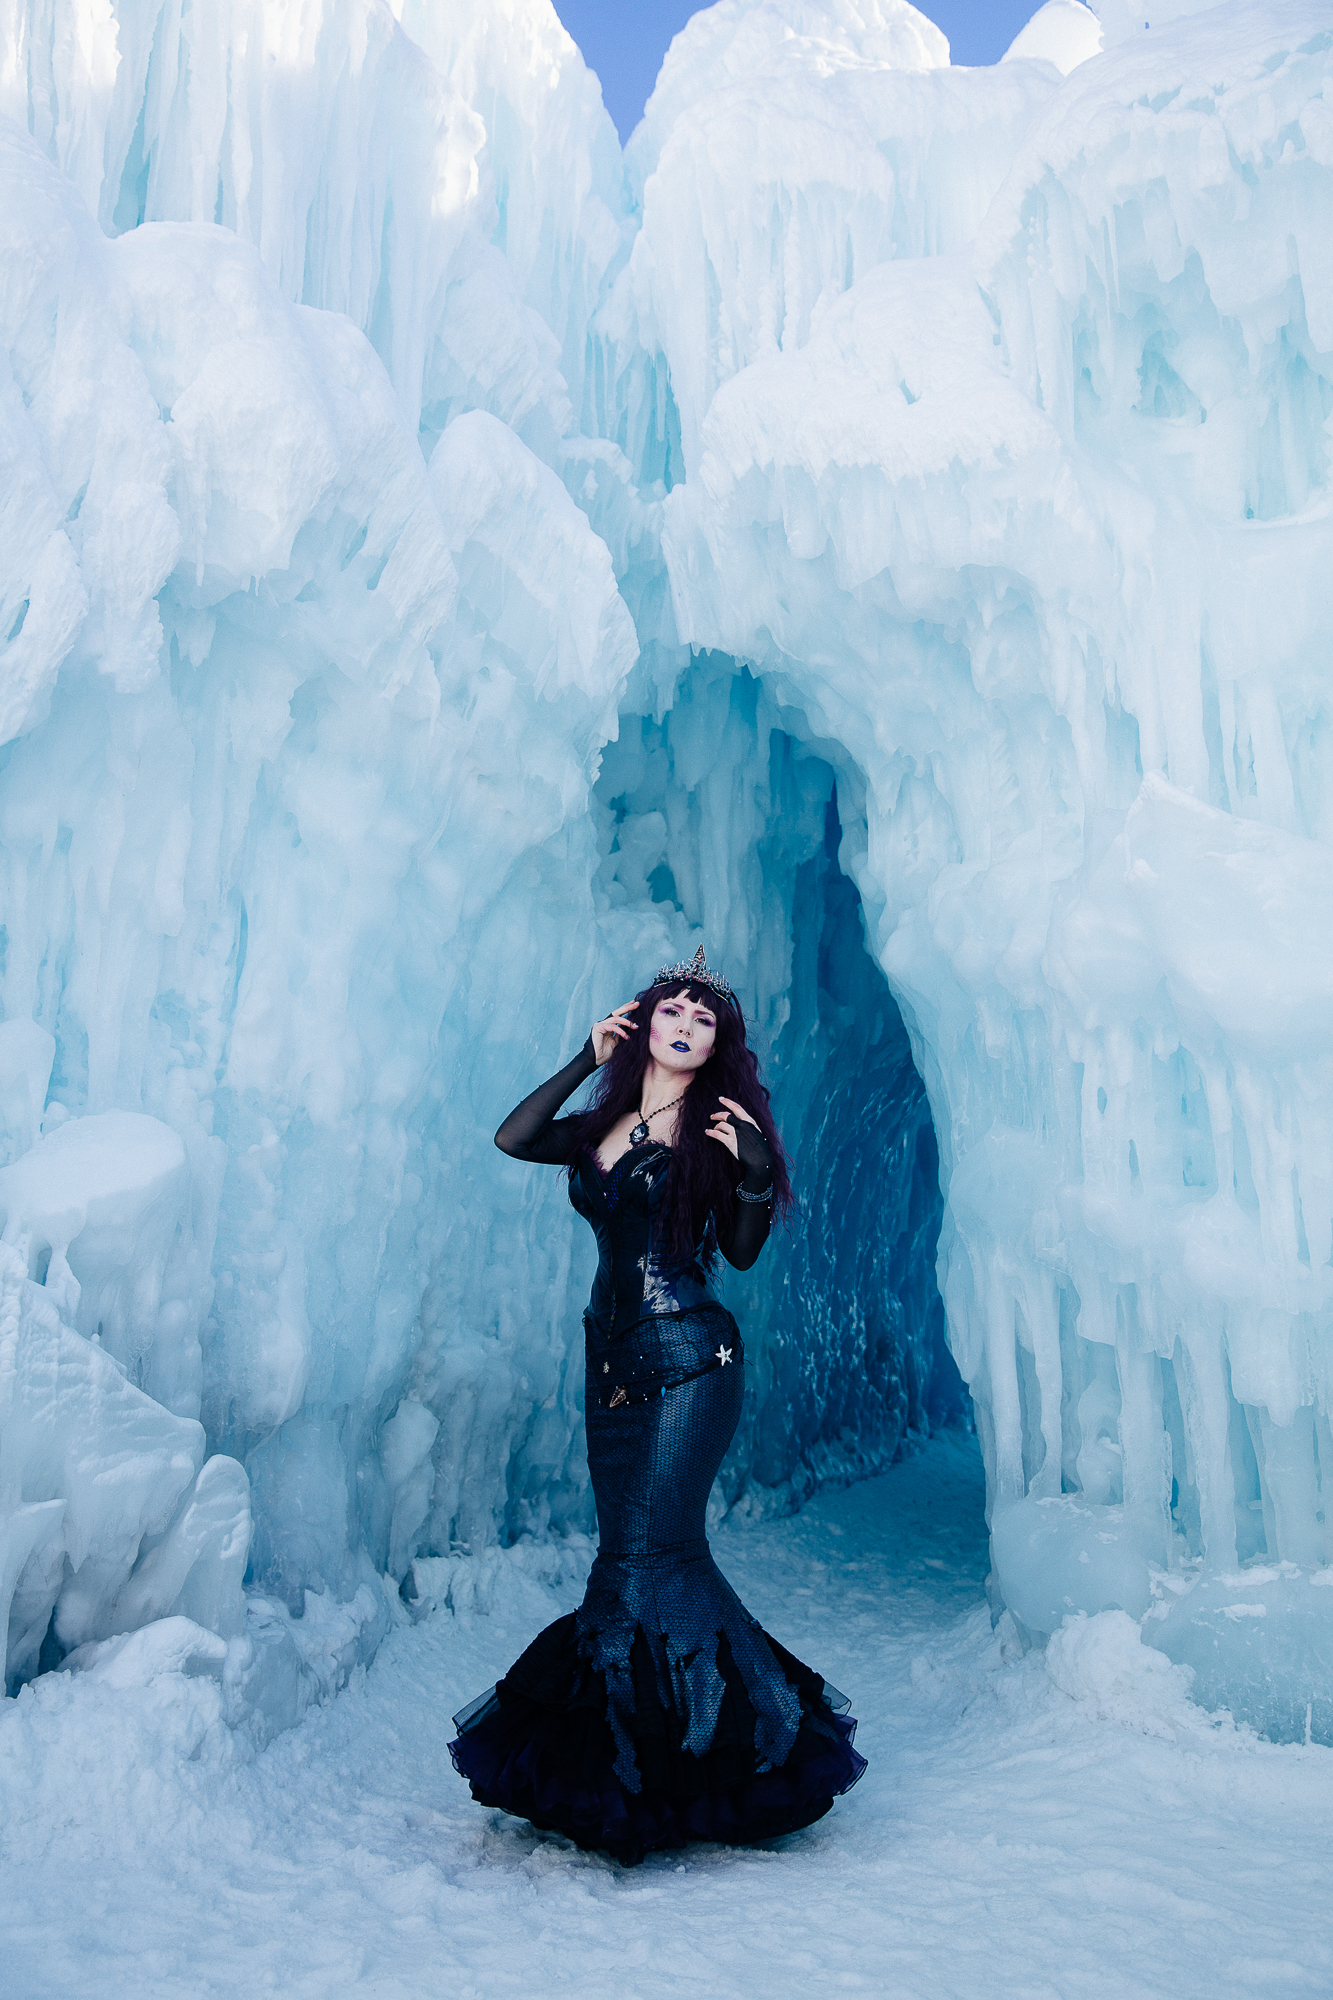 Jen_Montgomery_Photography_KMK_Ice_Mermaids_REEDITS_FB-10.jpg